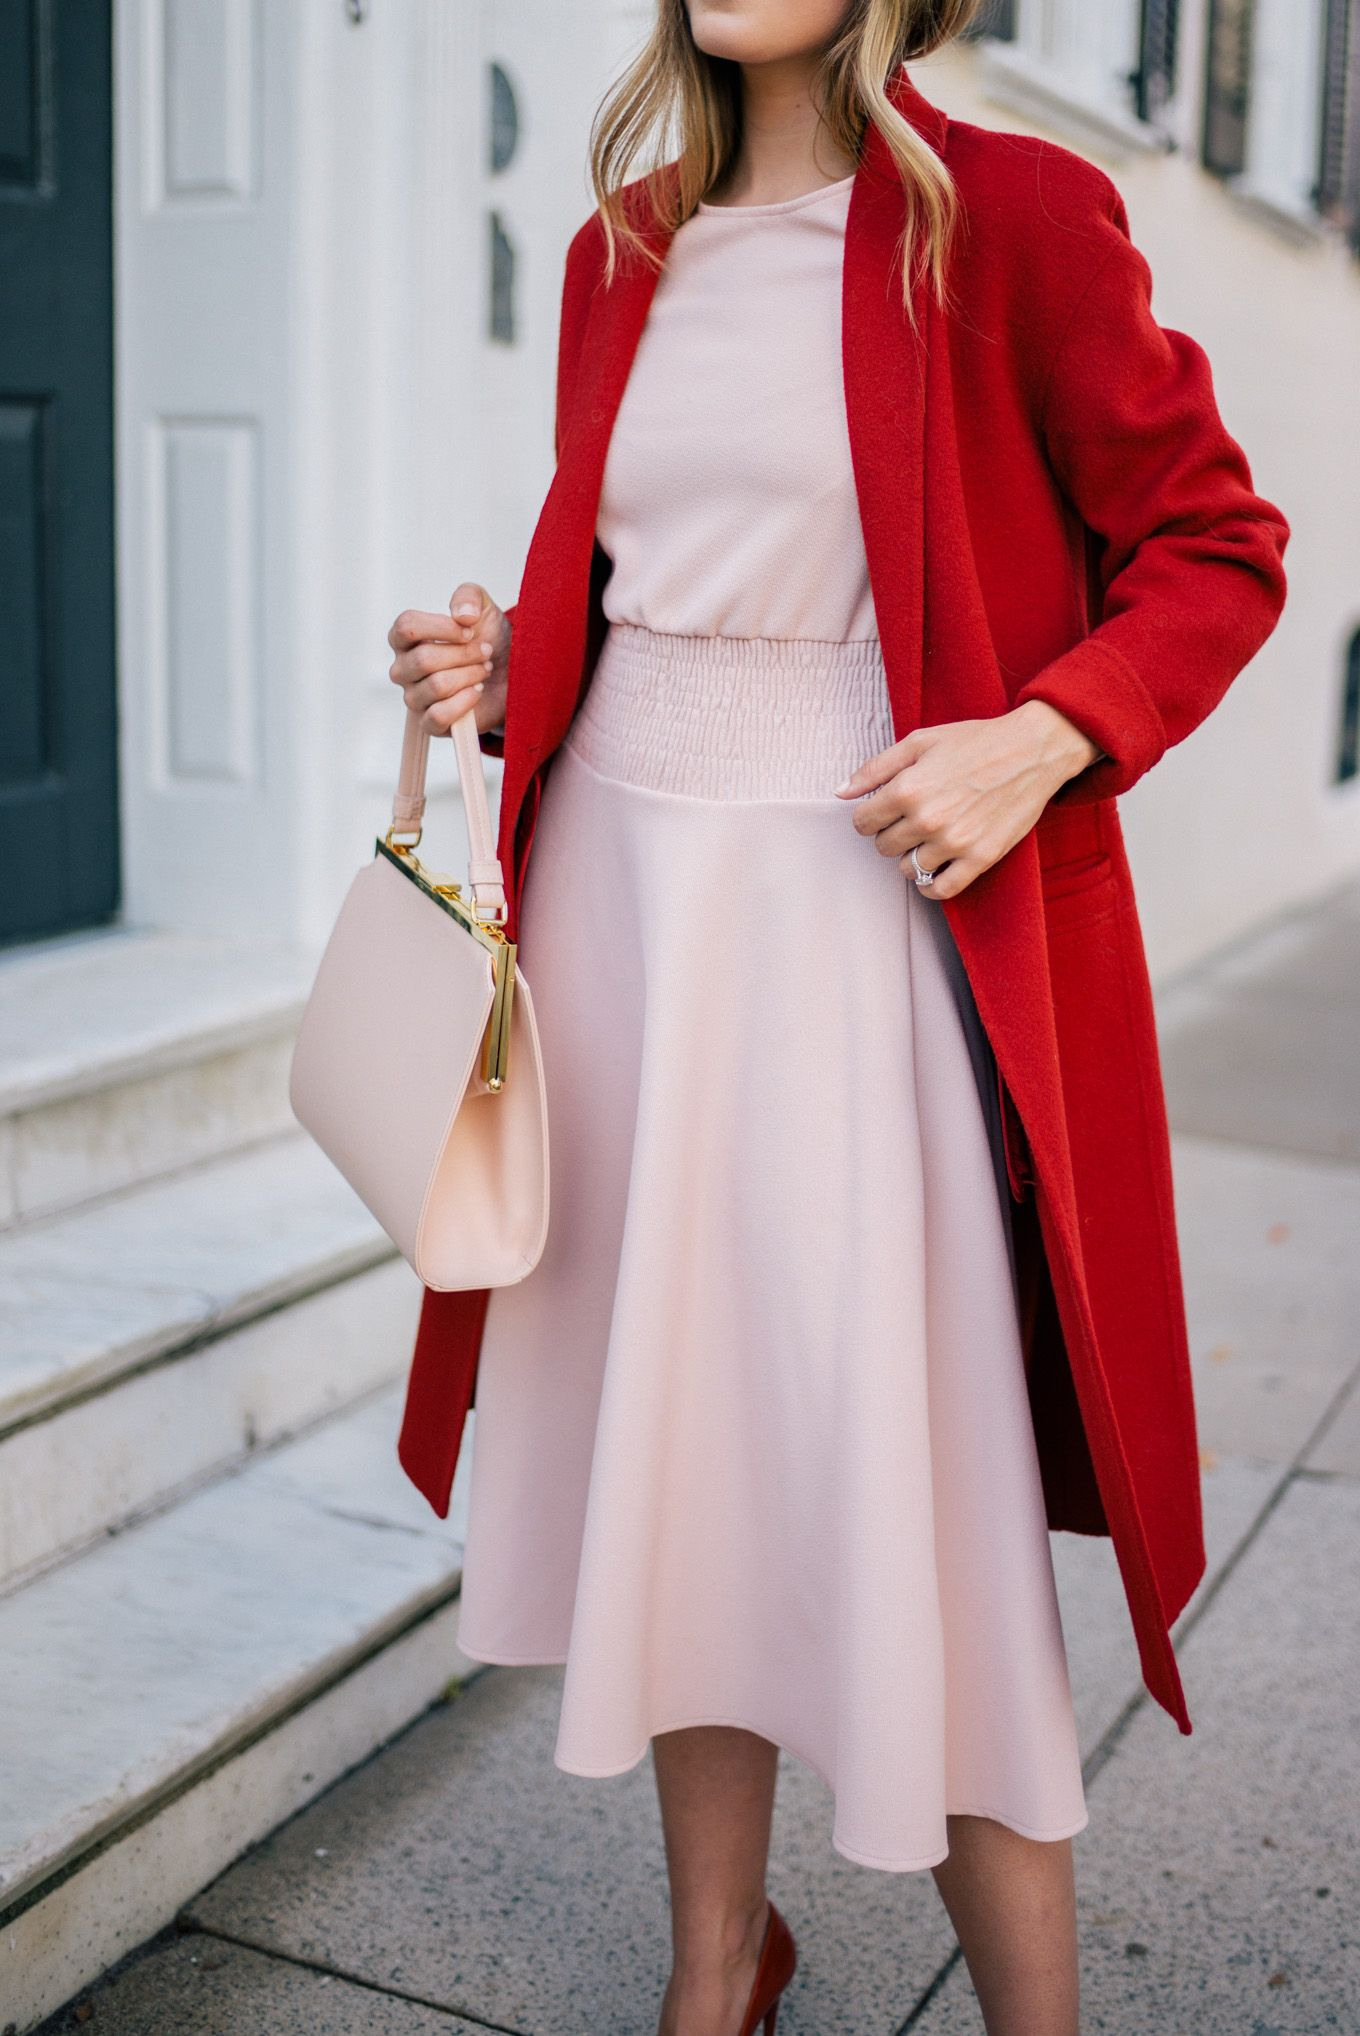 Blush Pink Dress & Red Coat   Mode, Mantel Rot Und Kleidung